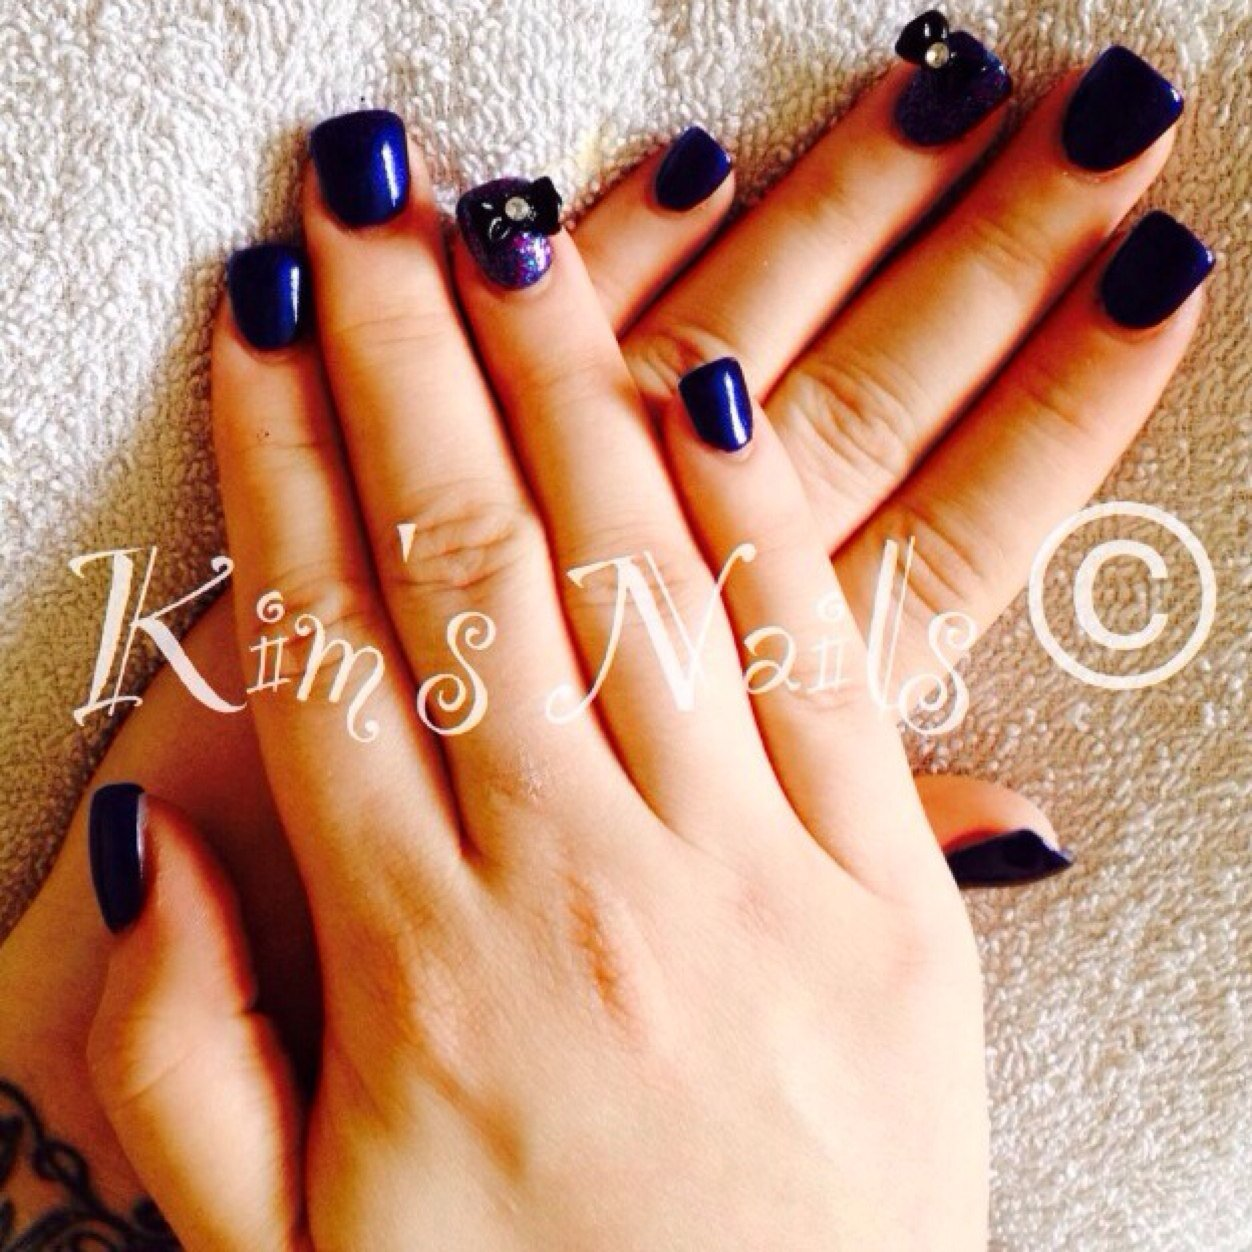 Old Fashioned Kims Nails Illustration - Nail Art Ideas - morihati.com